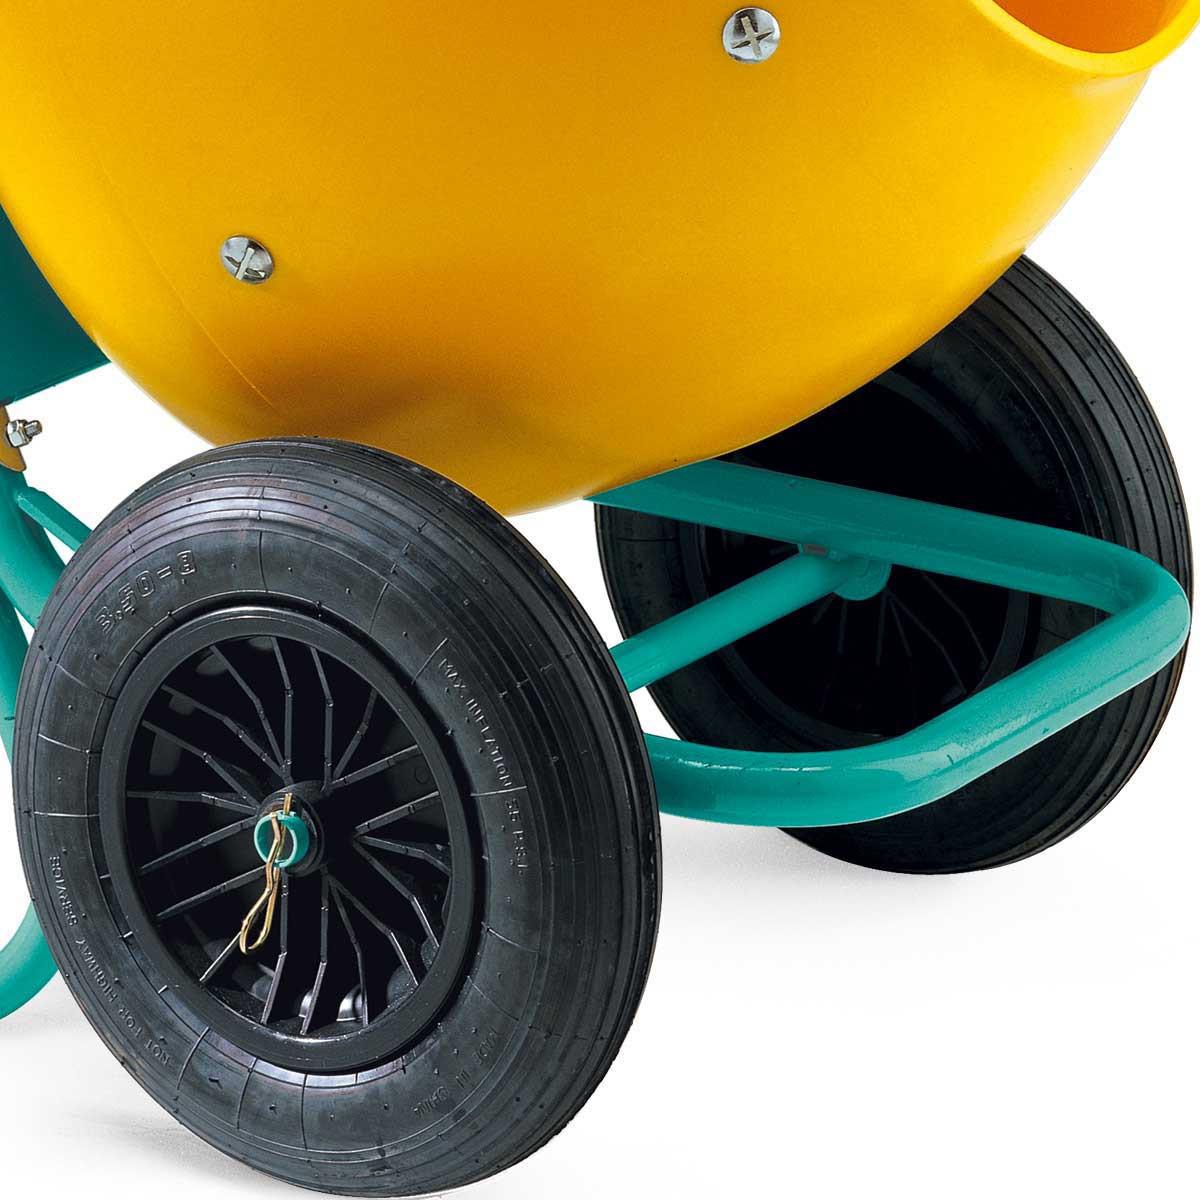 Imer Wheelman Concrete Mixer wheels